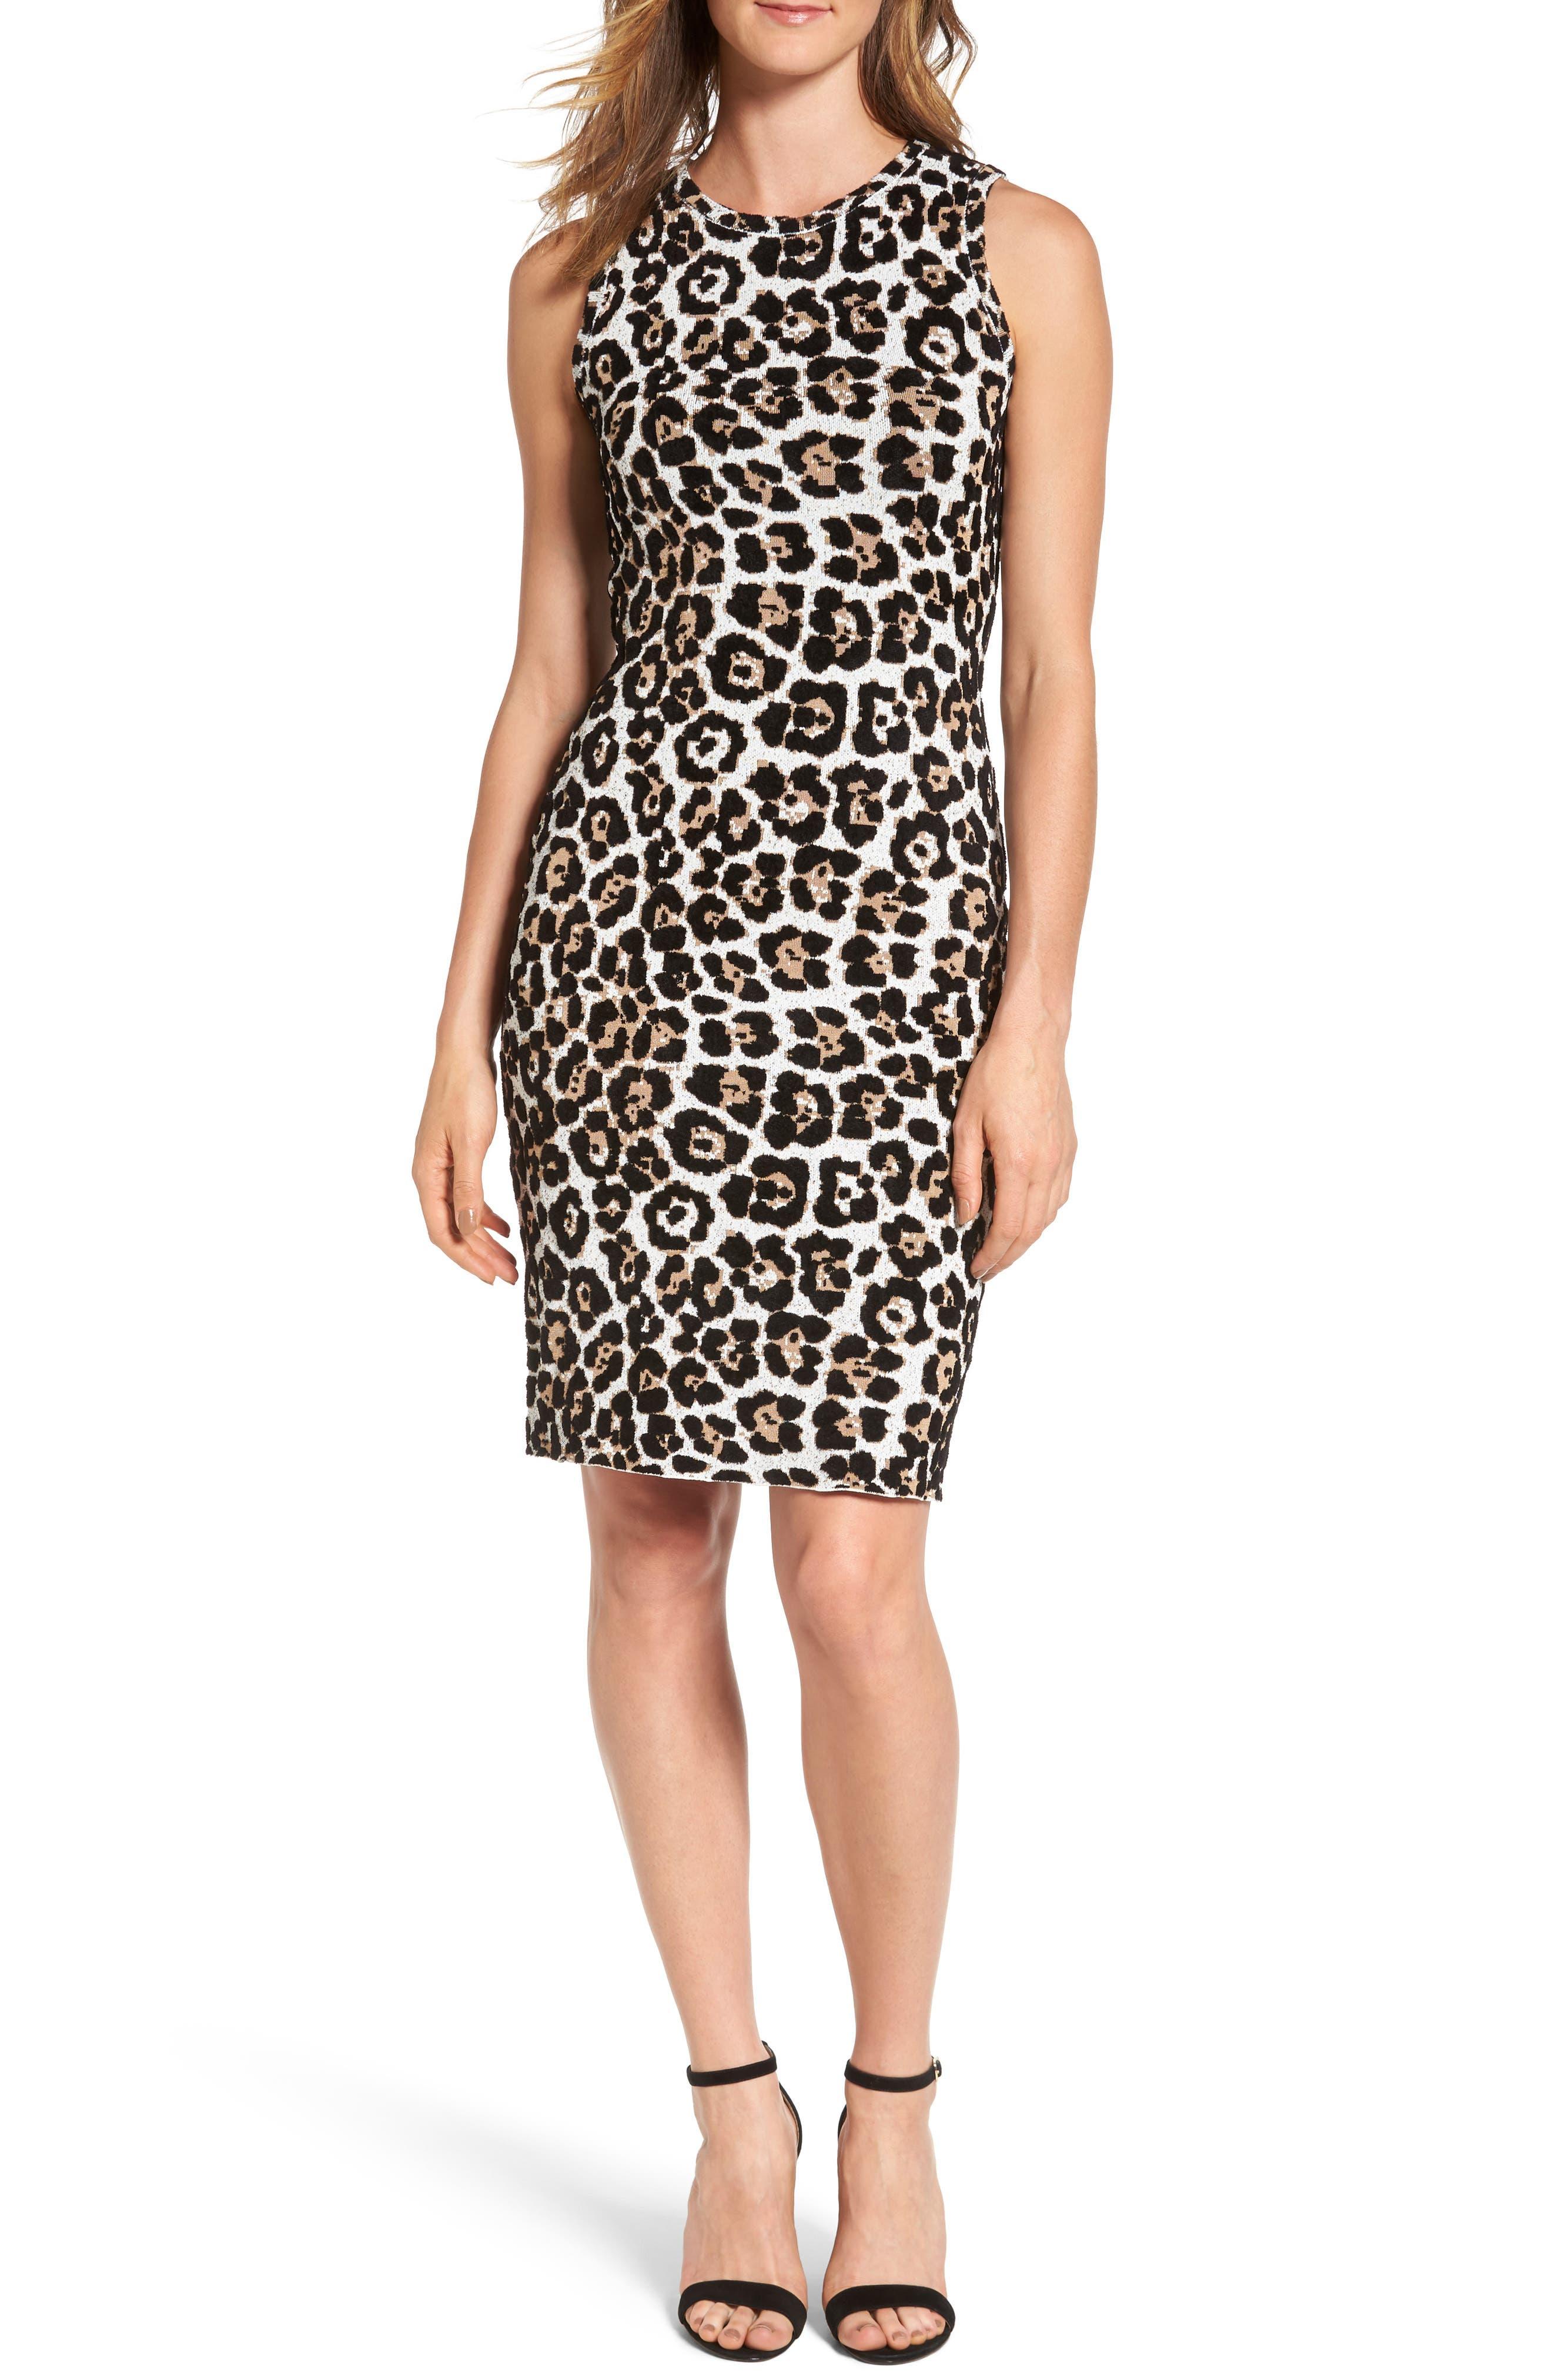 Alternate Image 1 Selected - MICHAEL Michael Kors Animal Print Sheath Dress